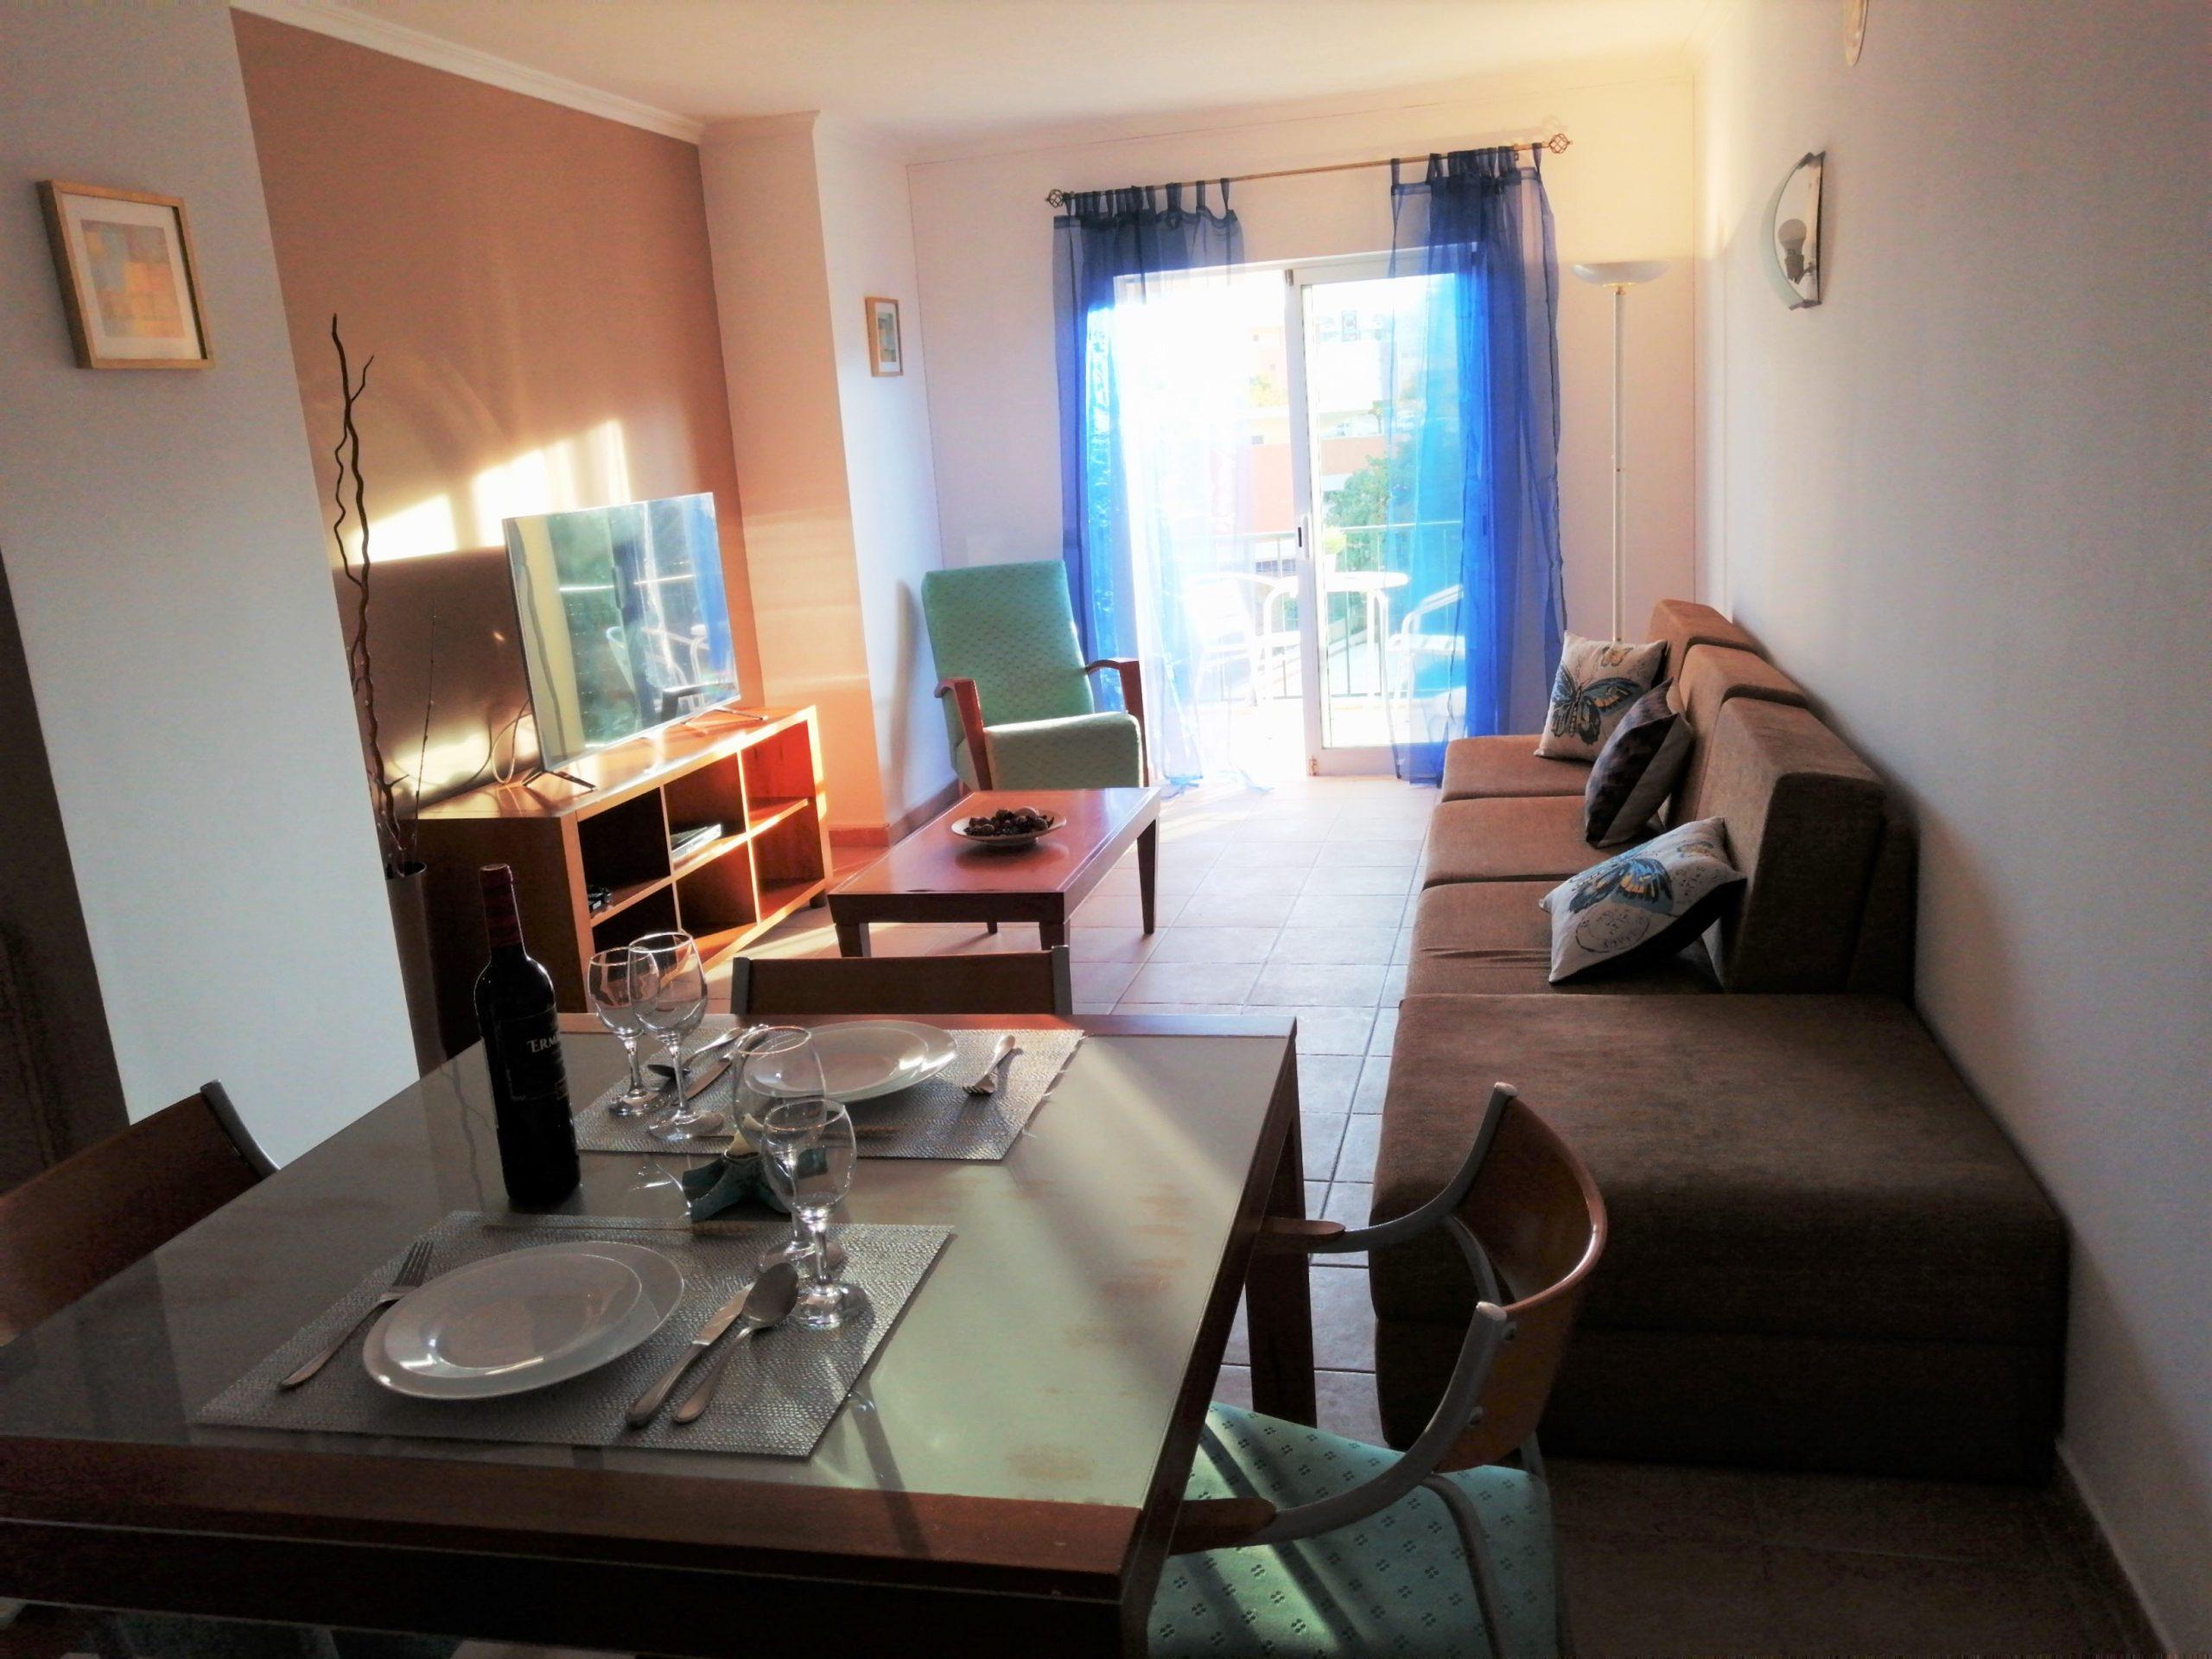 Holiday apartments and villas for rent, T1 Albufeira em cond. fechado c/ piscina 4/5 pessoas JUN / JUL / AGO / SET in Albufeira, Portugal Algarve, REF_IMG_14867_14874